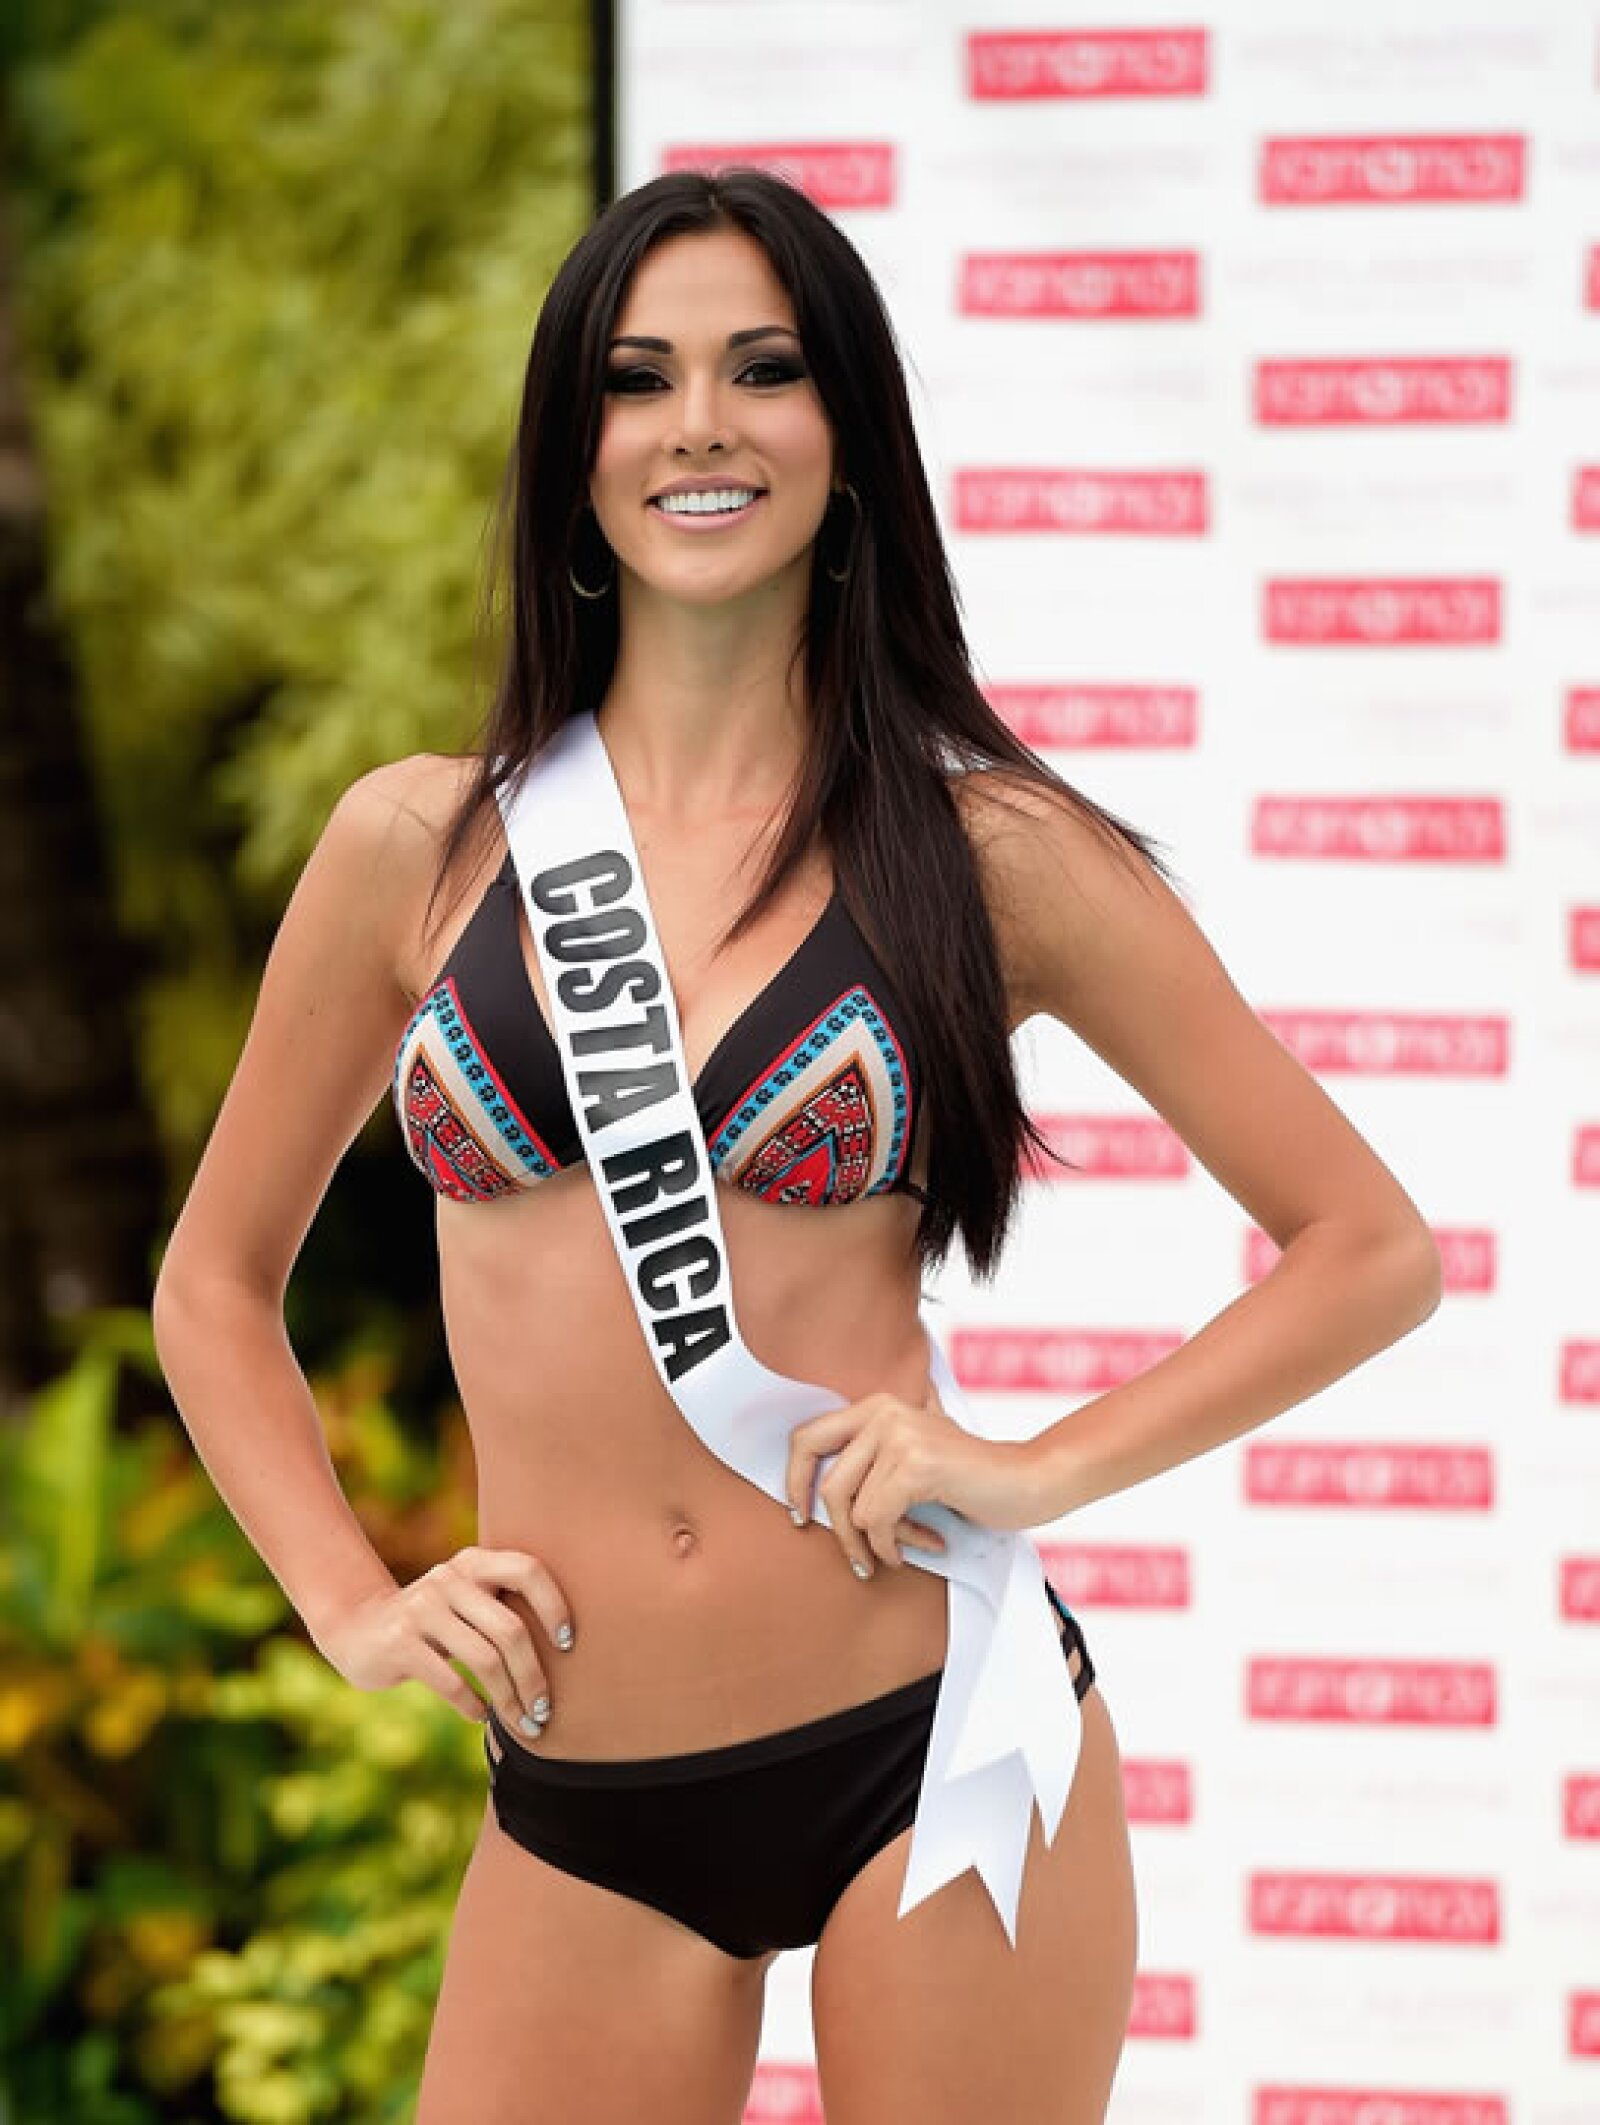 Otra latinoamericana es Karina Ramos, de Costa Rica.